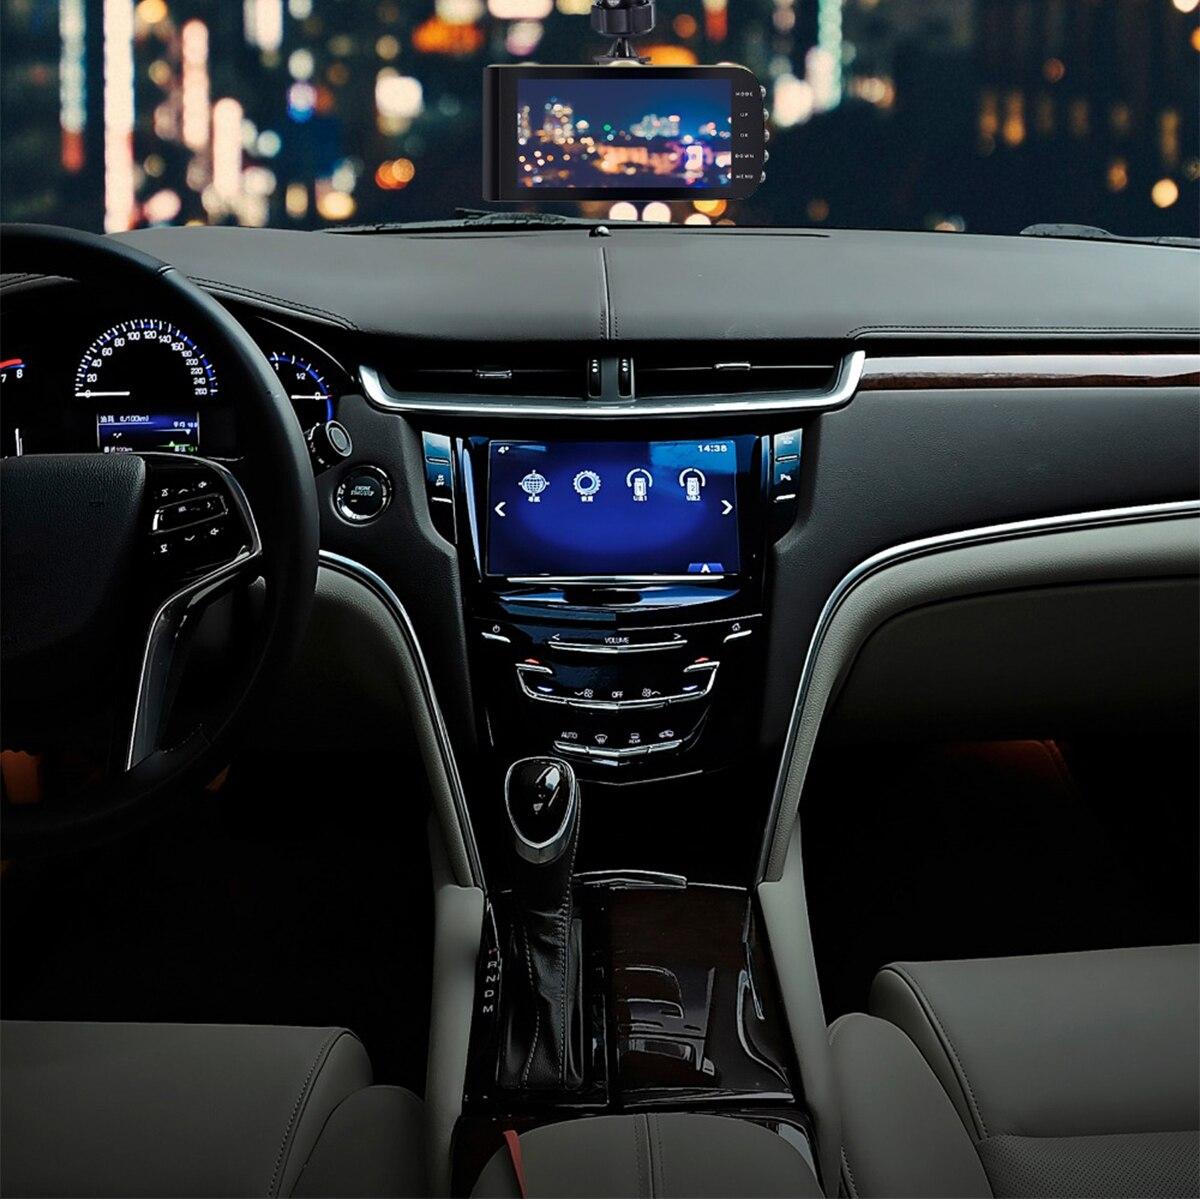 A23 1080P HD Dual Lens Car DVR 4 Inch LCD Video Dash Cam Recorder Night Vision G-sensor